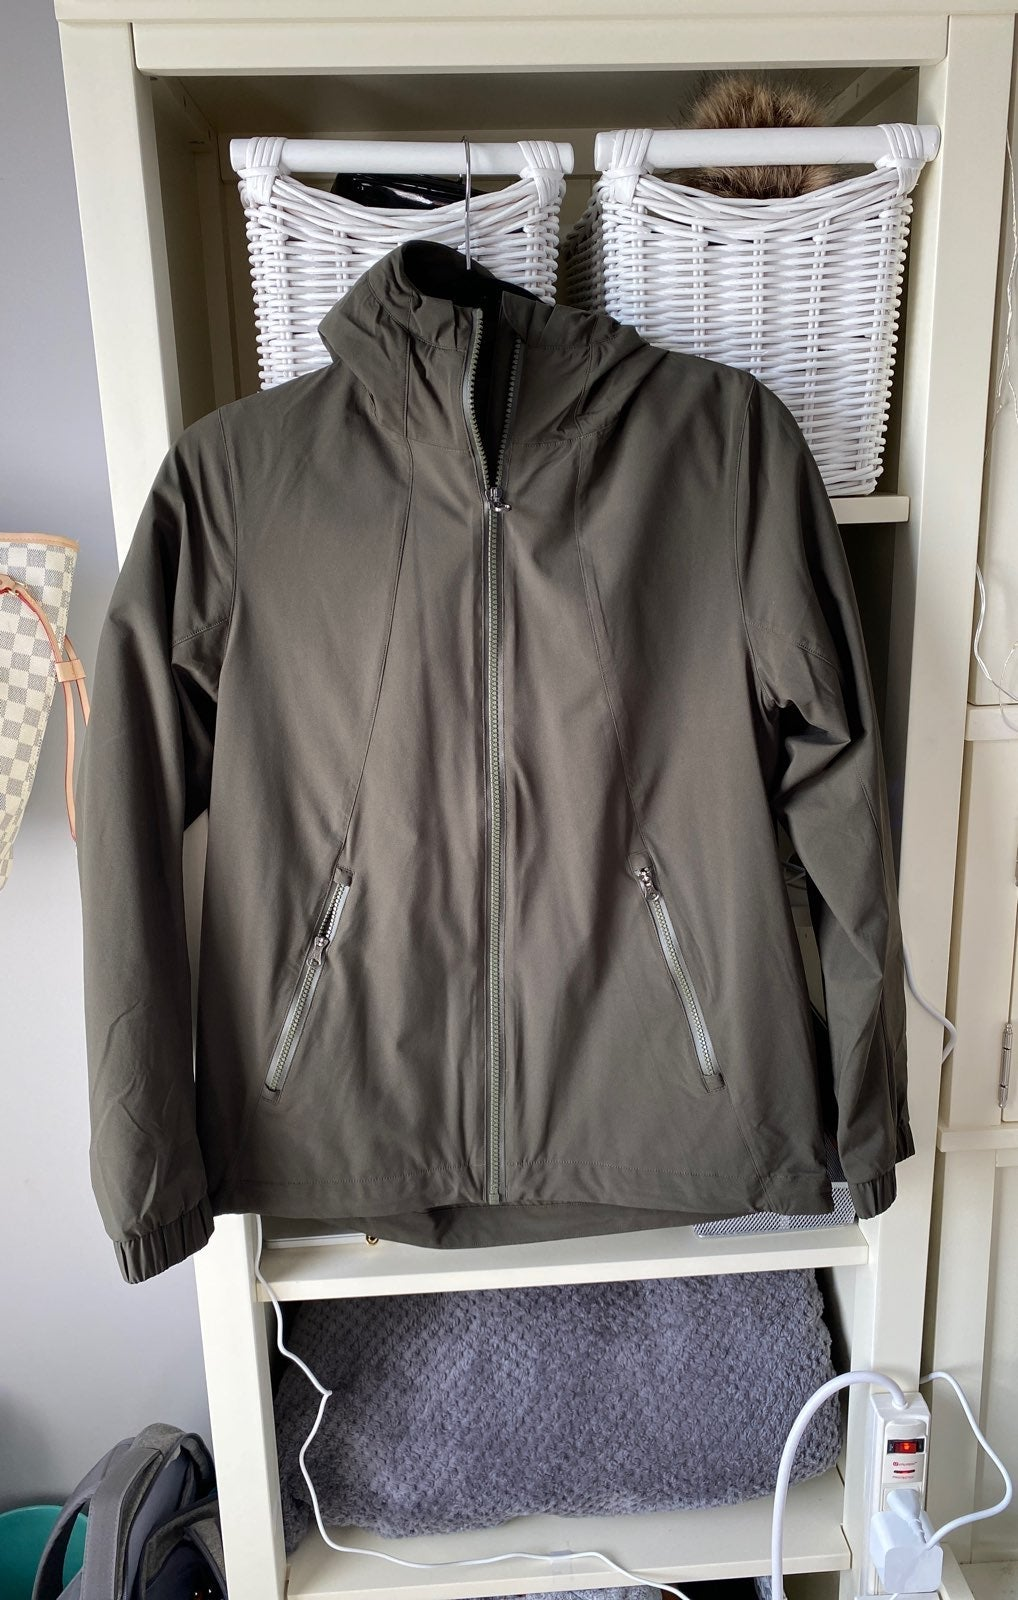 Lululemon Jacket/Windbreaker 6 DISCONTIN